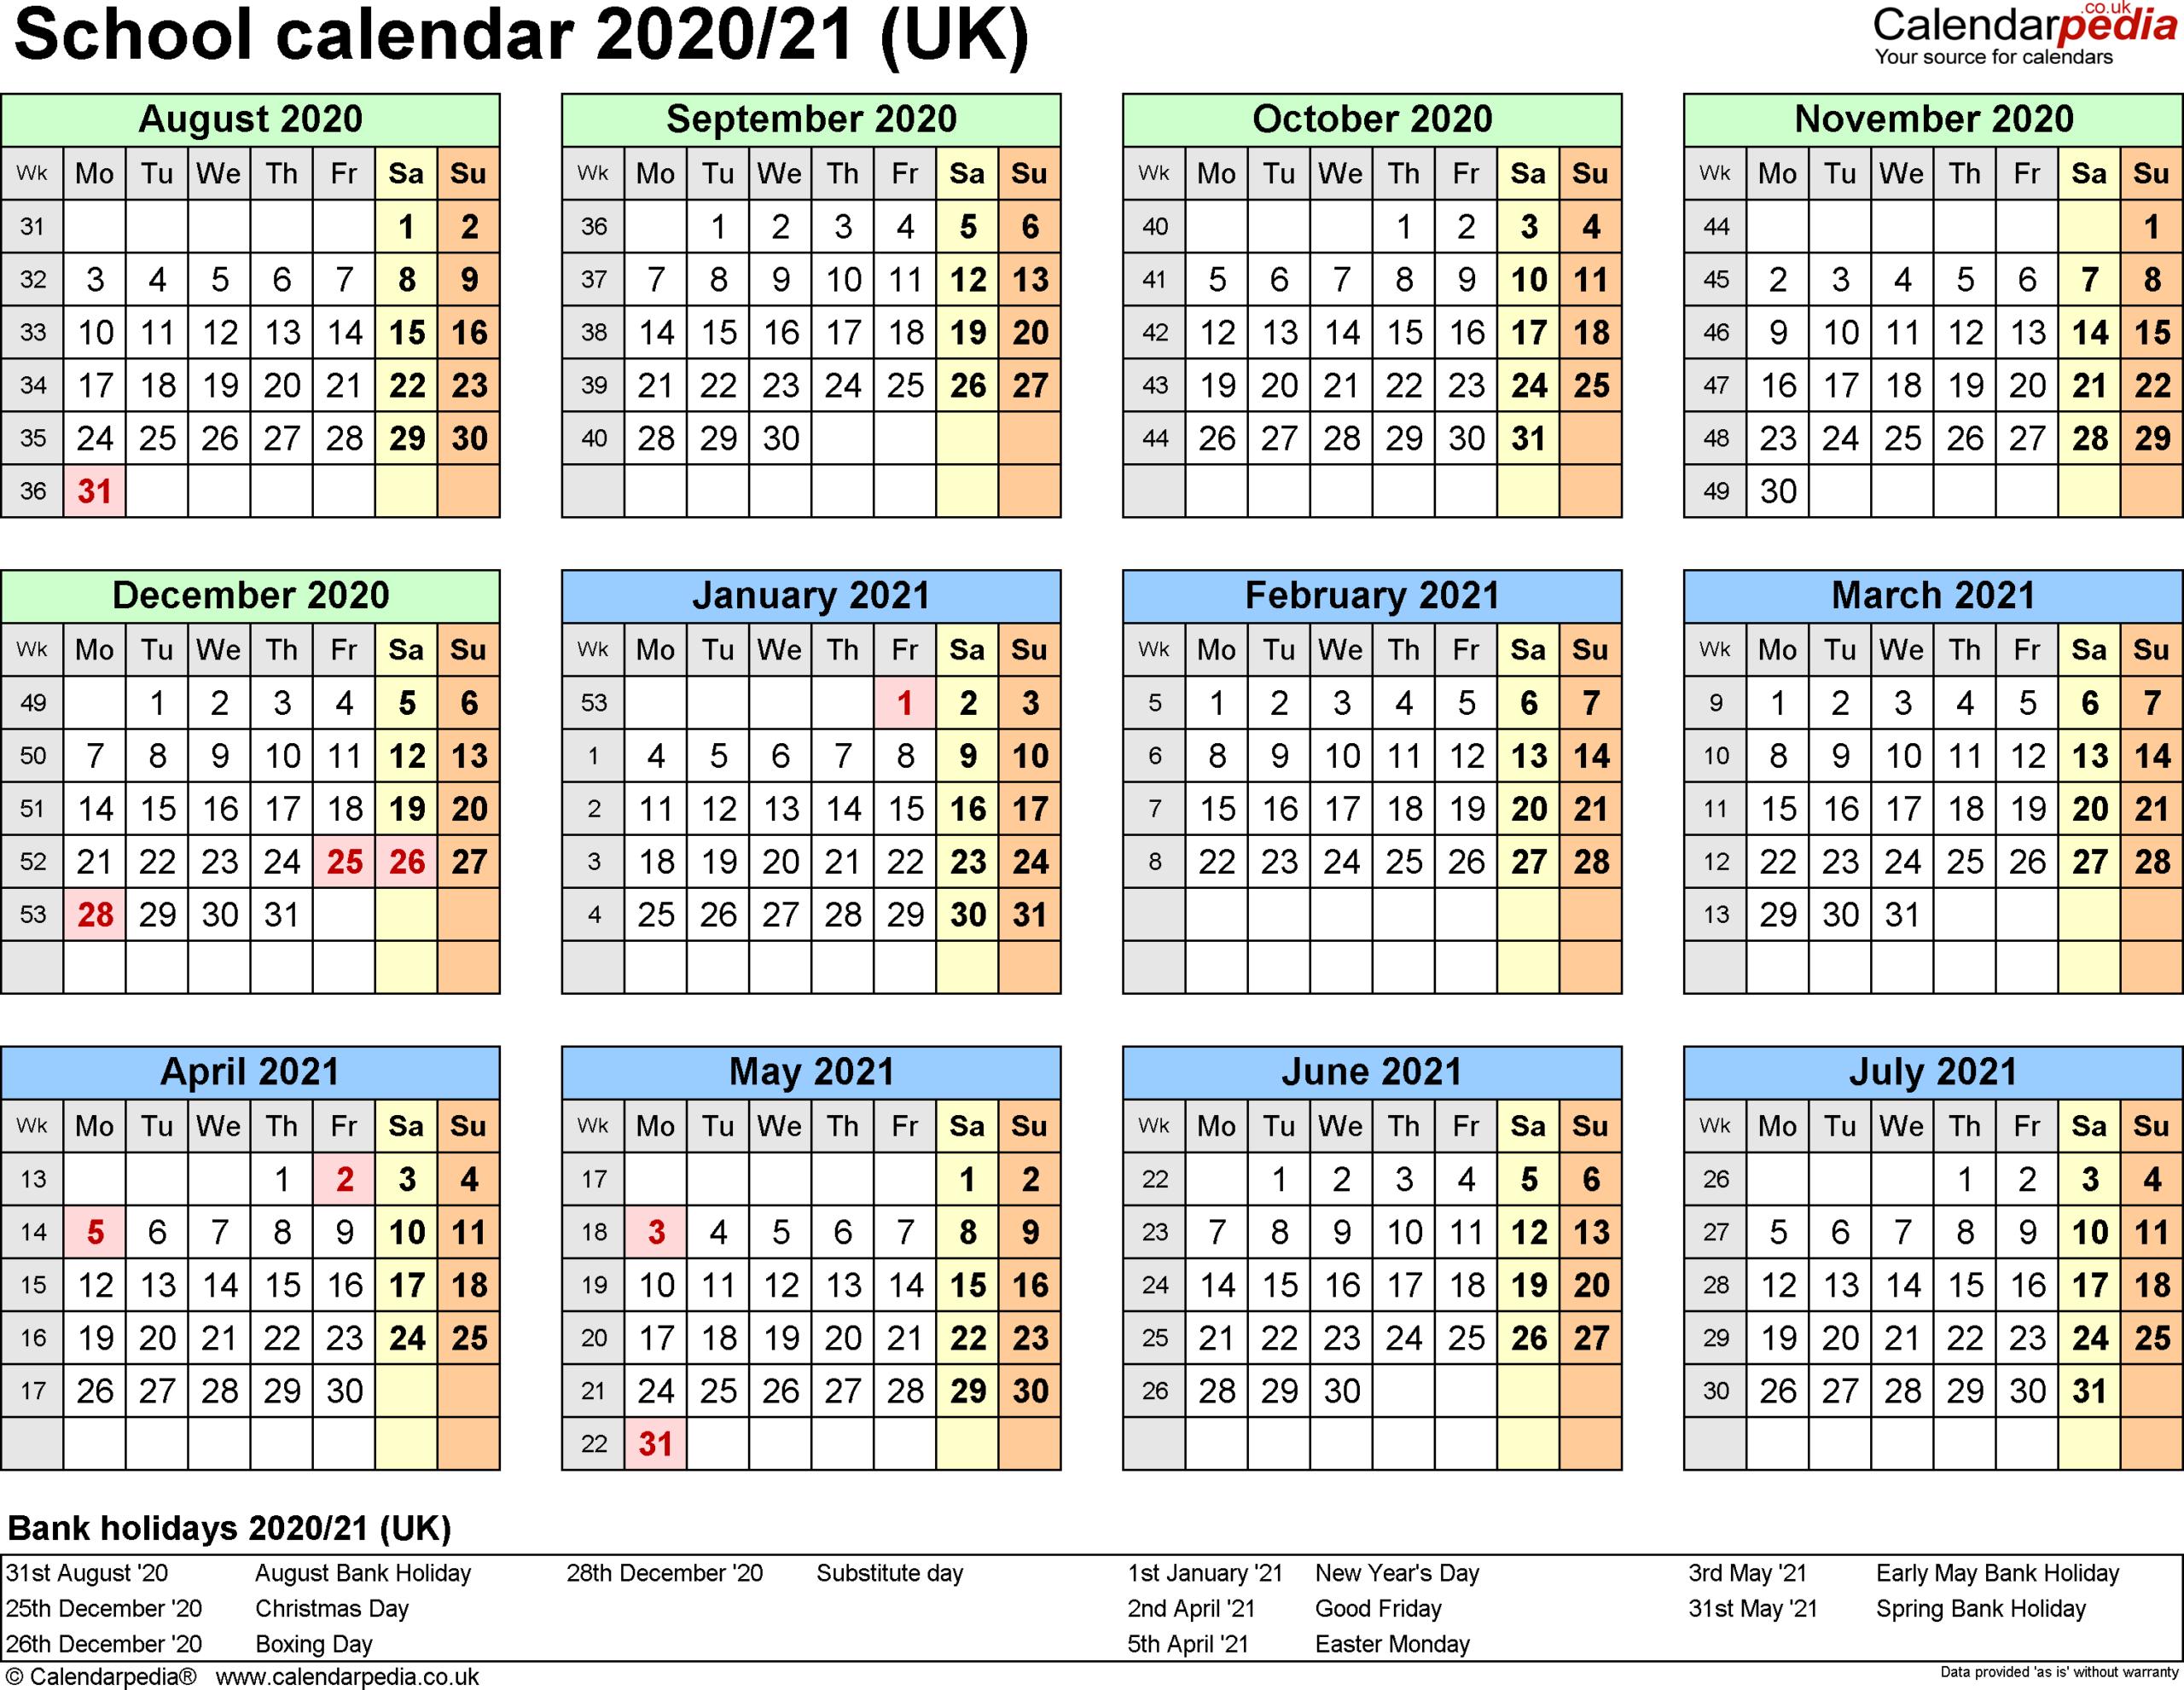 School Calendar 2020 To 2021 | Free Printable Calendar